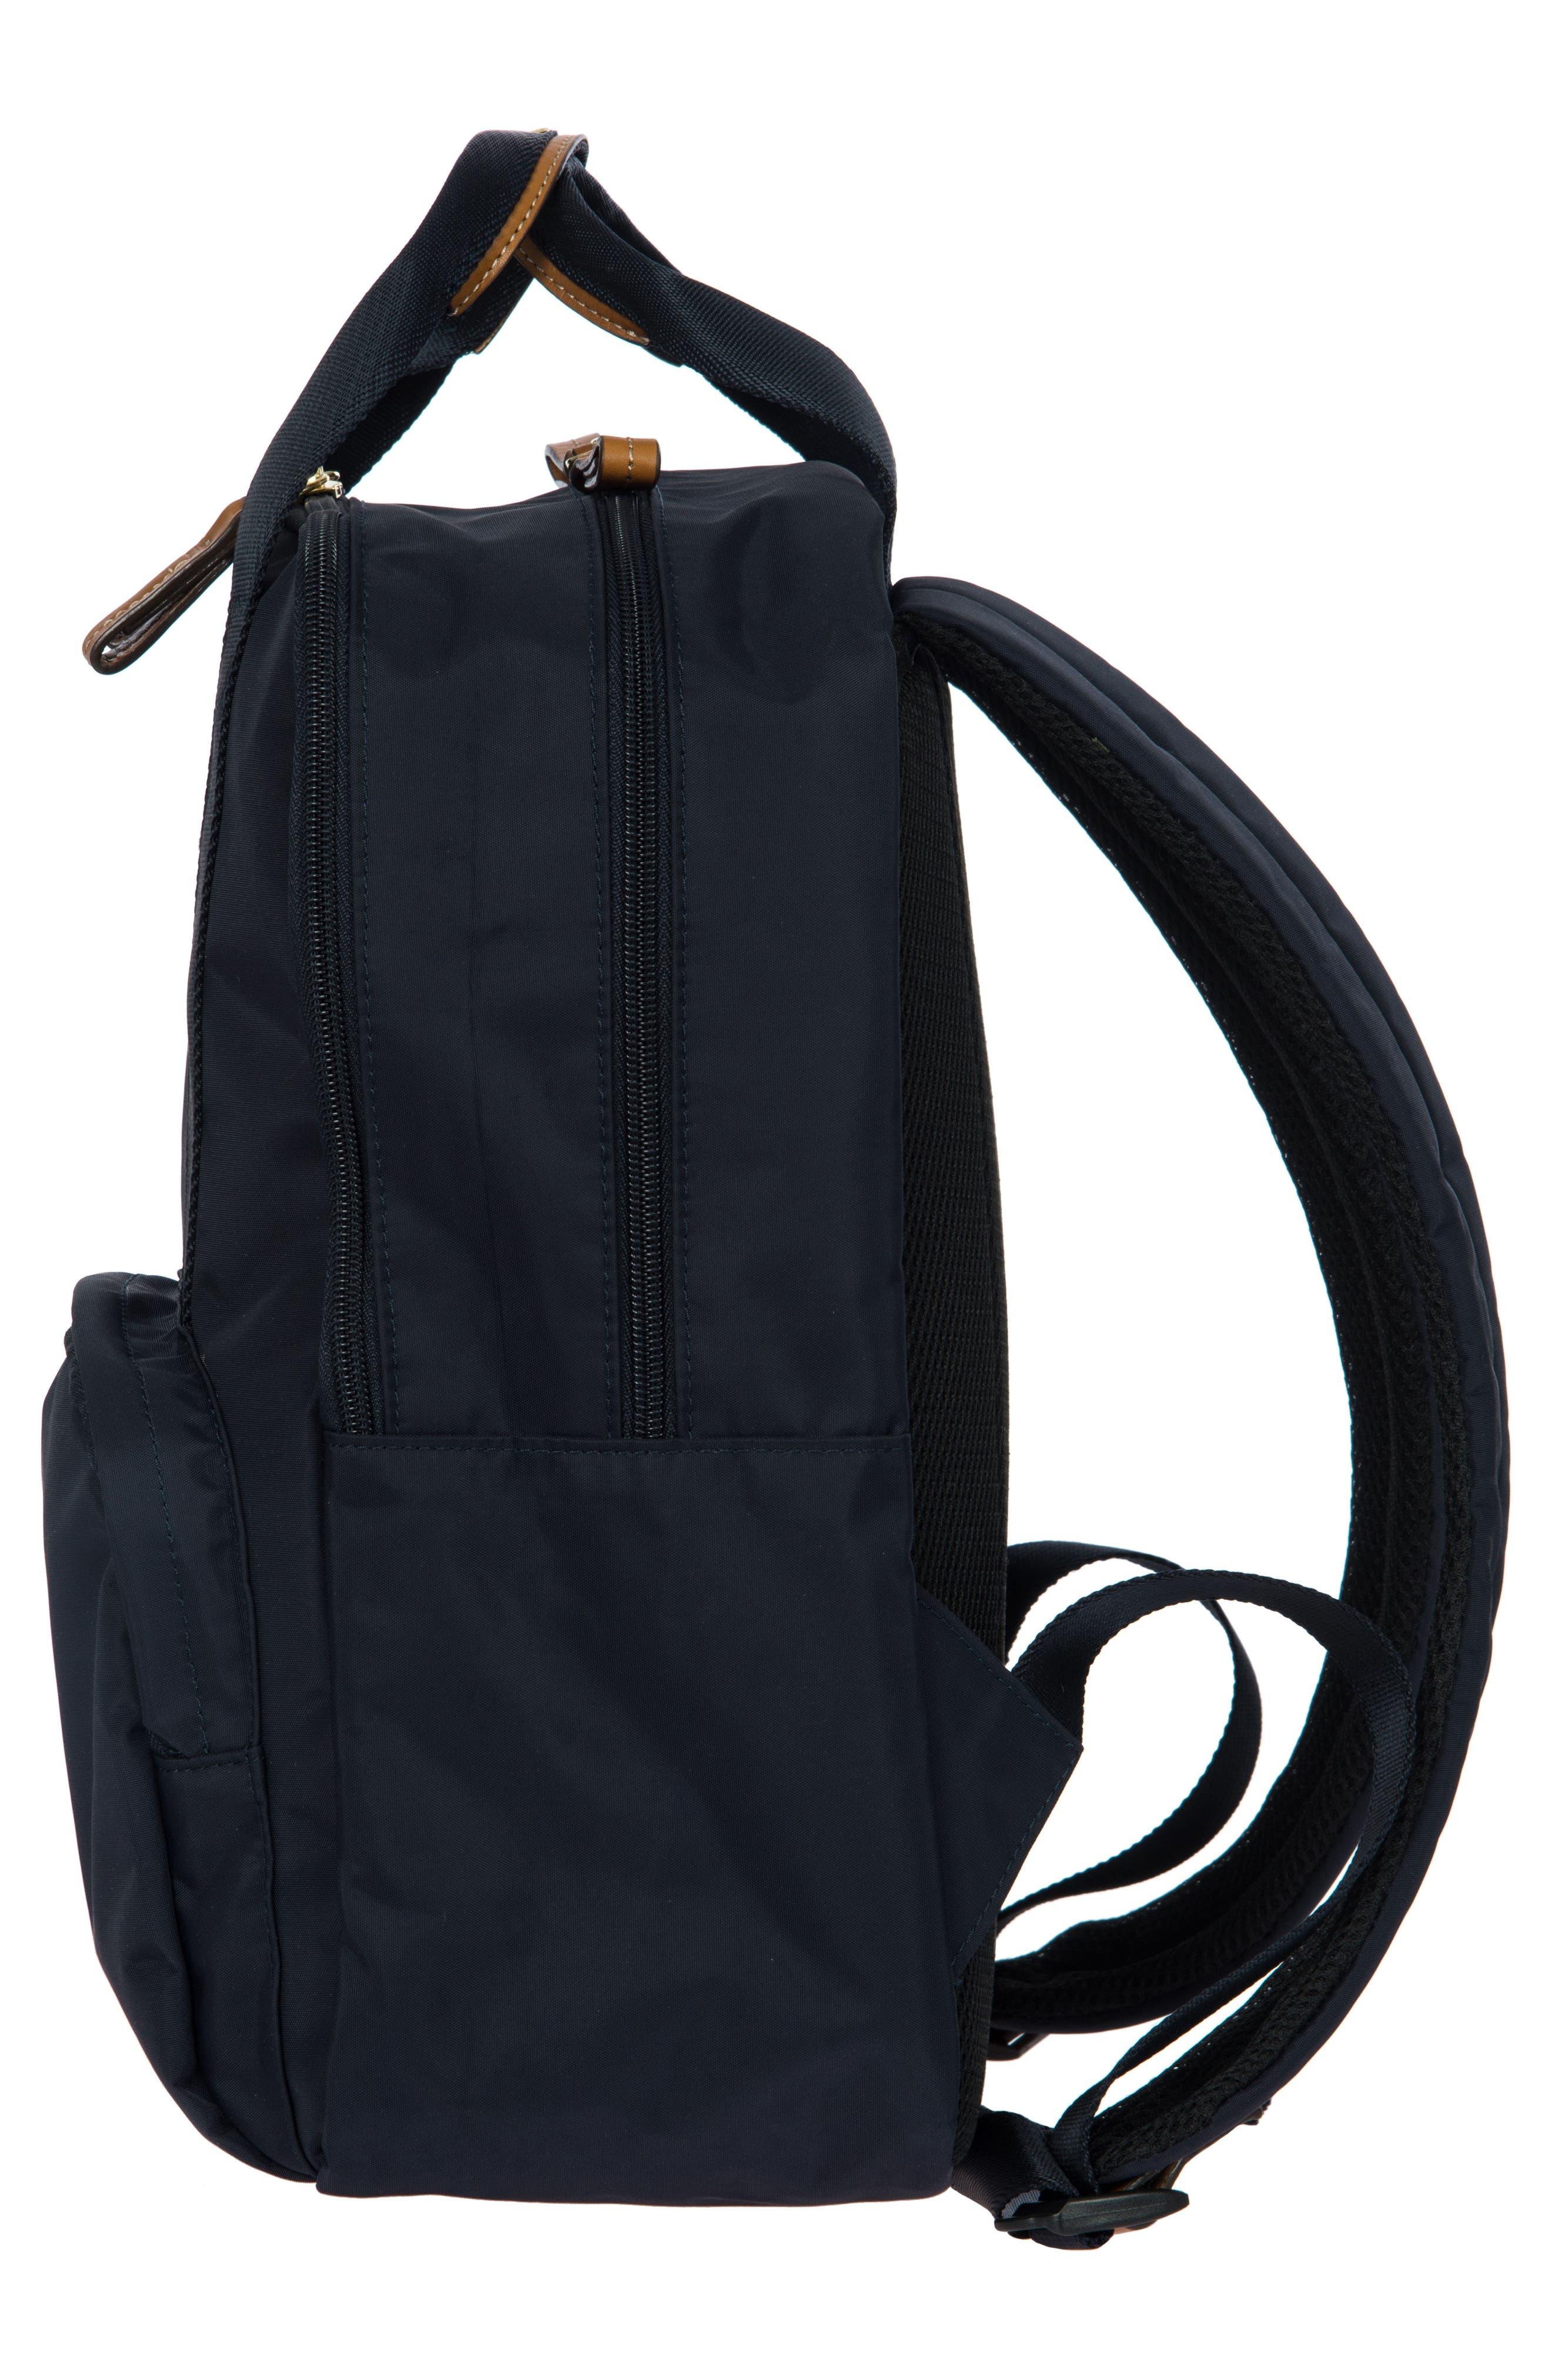 X-Bag Travel Urban Backpack,                             Alternate thumbnail 4, color,                             Navy